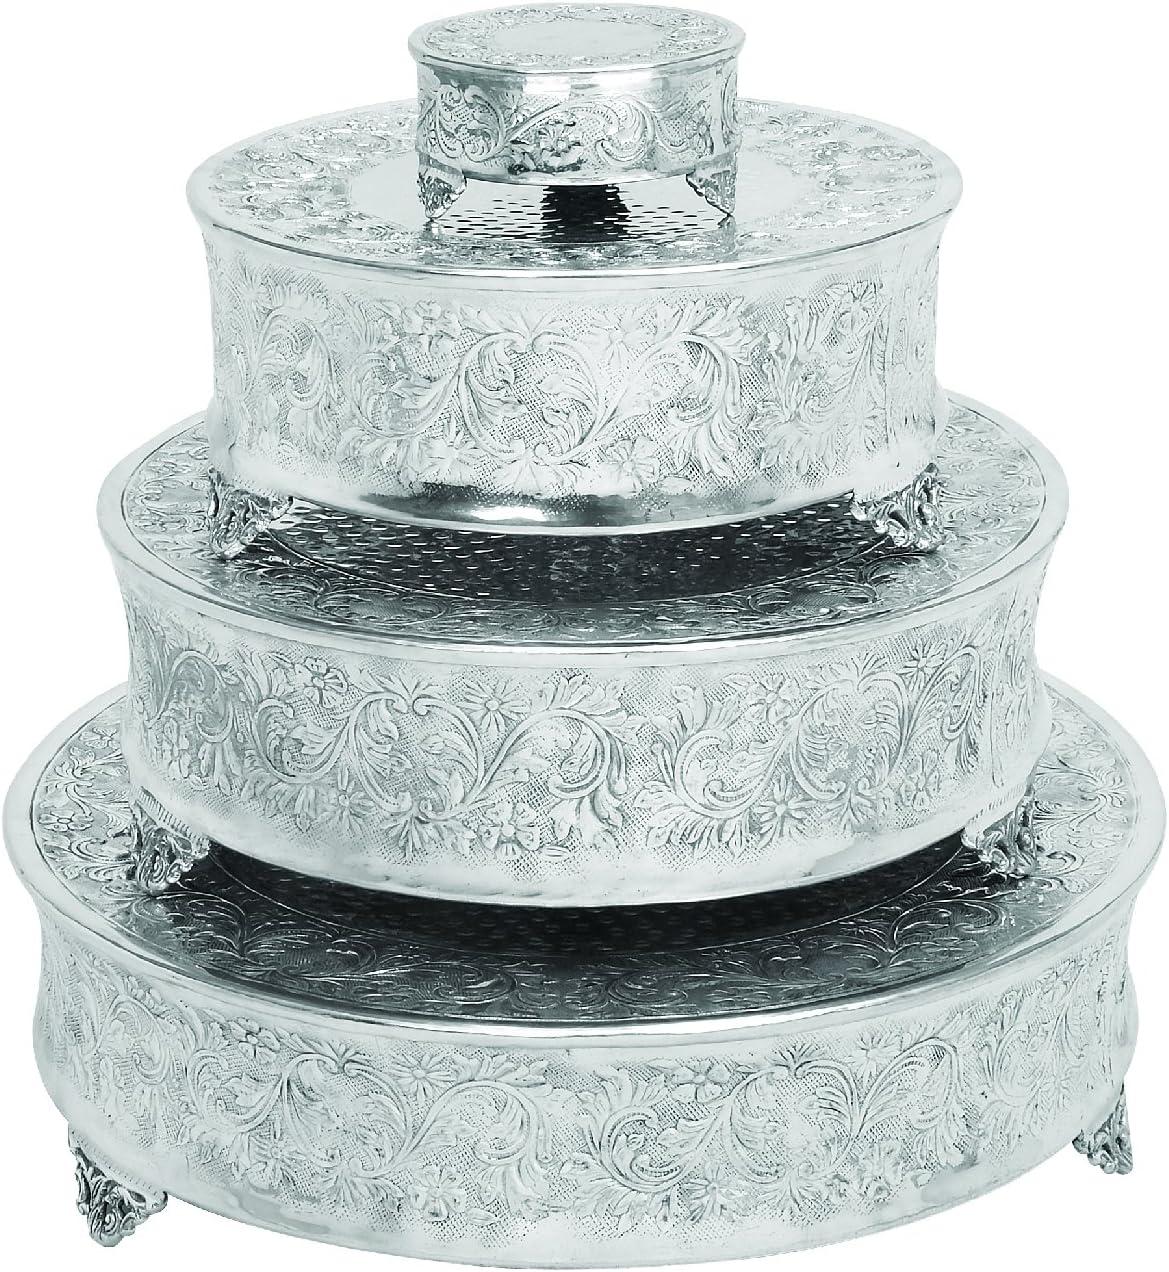 Set of 4 by Benzara Benzara Aluminum Cake Stand for Stylish Host